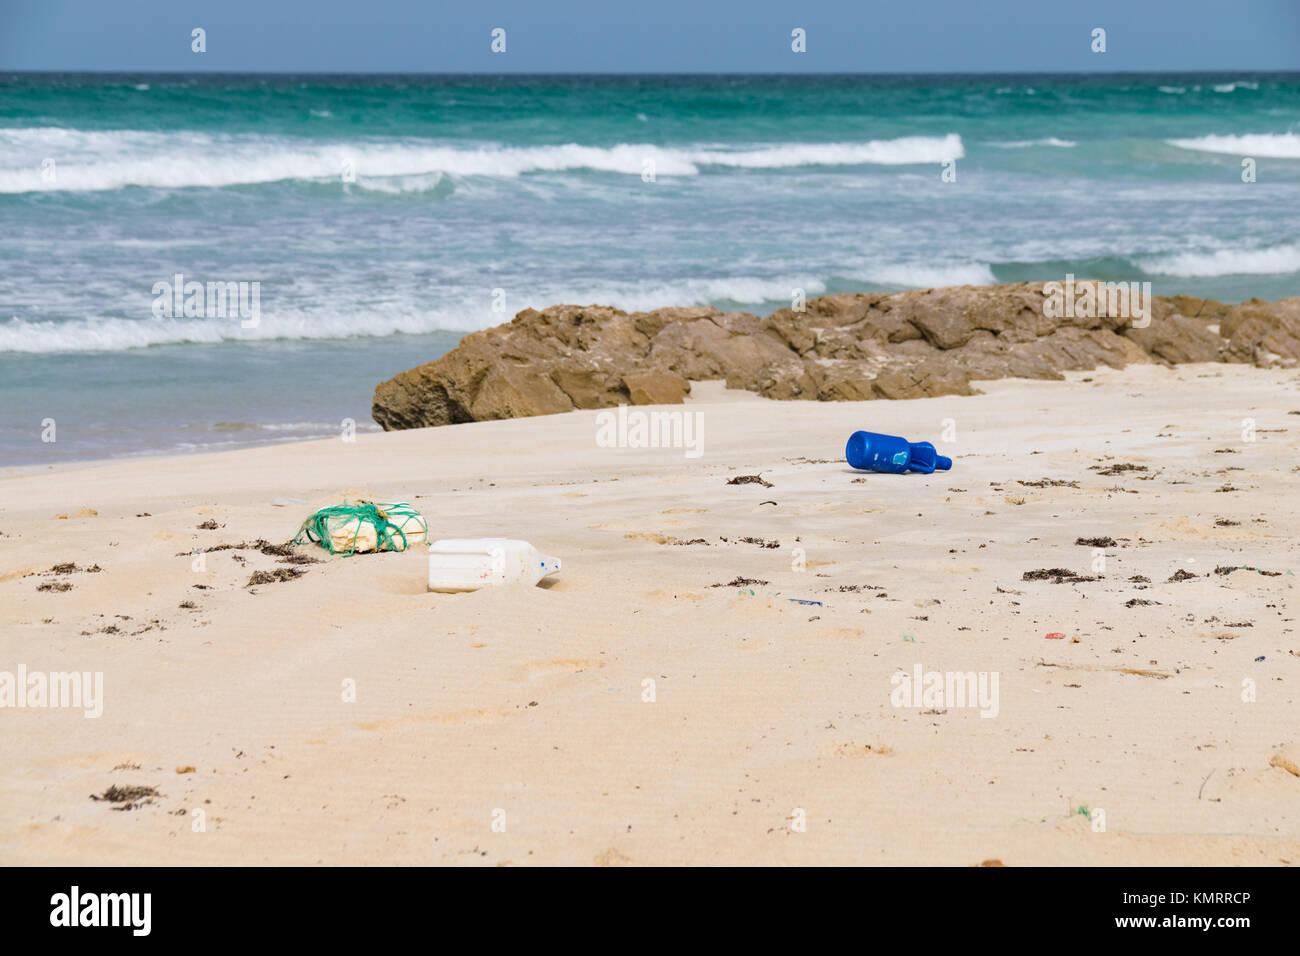 Plastic and discarded rubbish brought in by the Atlantic Ocean on Santa Maria Beach, Boa Vista Cape Verde - Stock Image